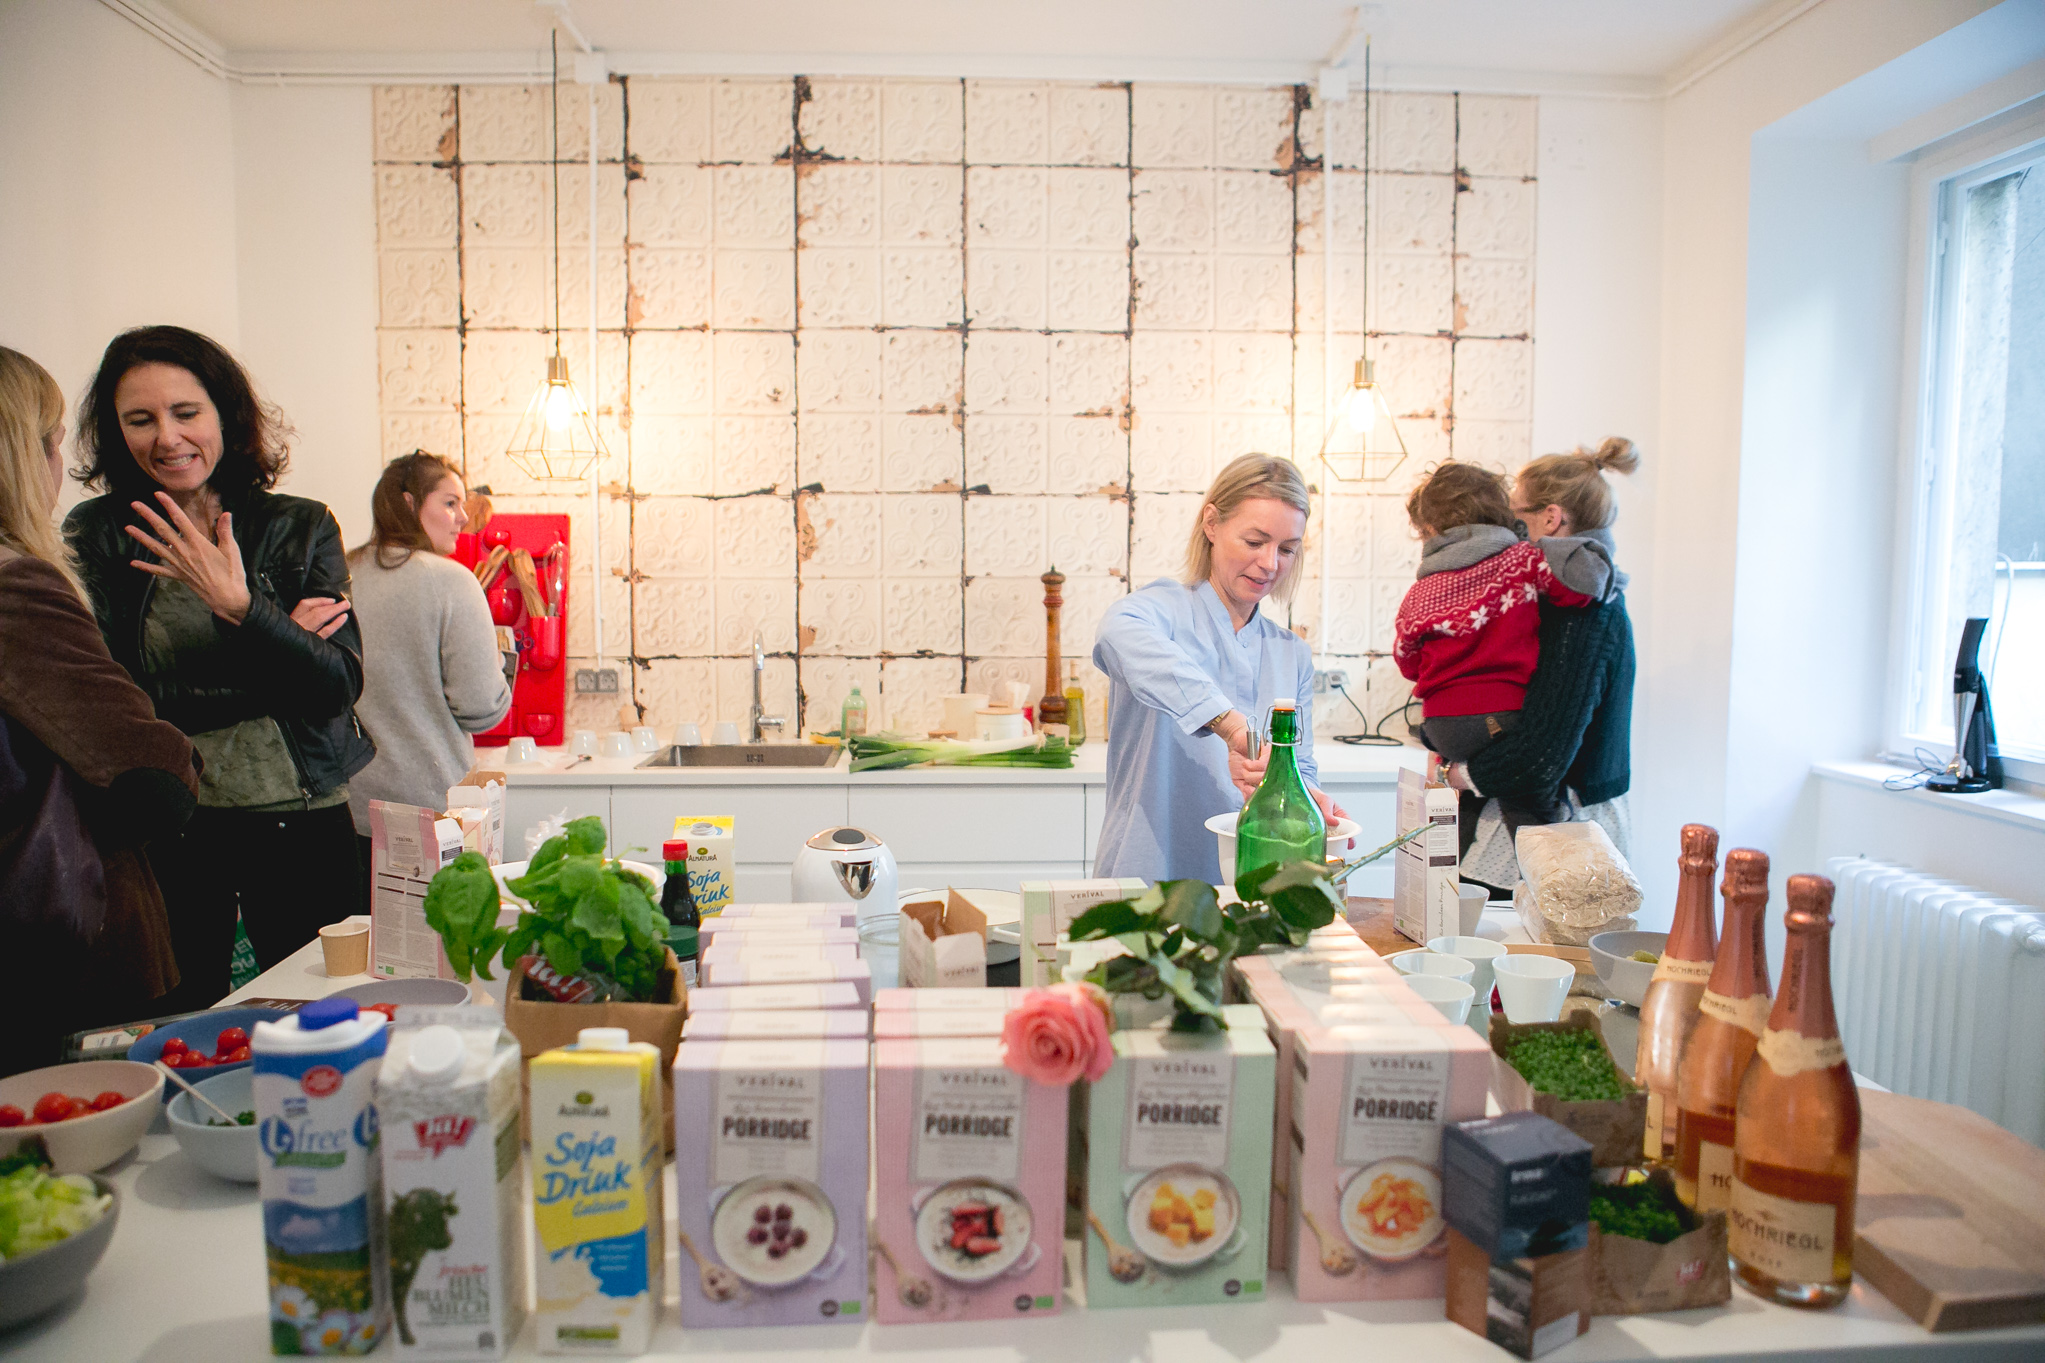 Die Verival Porridge-Küche im RoughCutStudio © Florence Stoiber